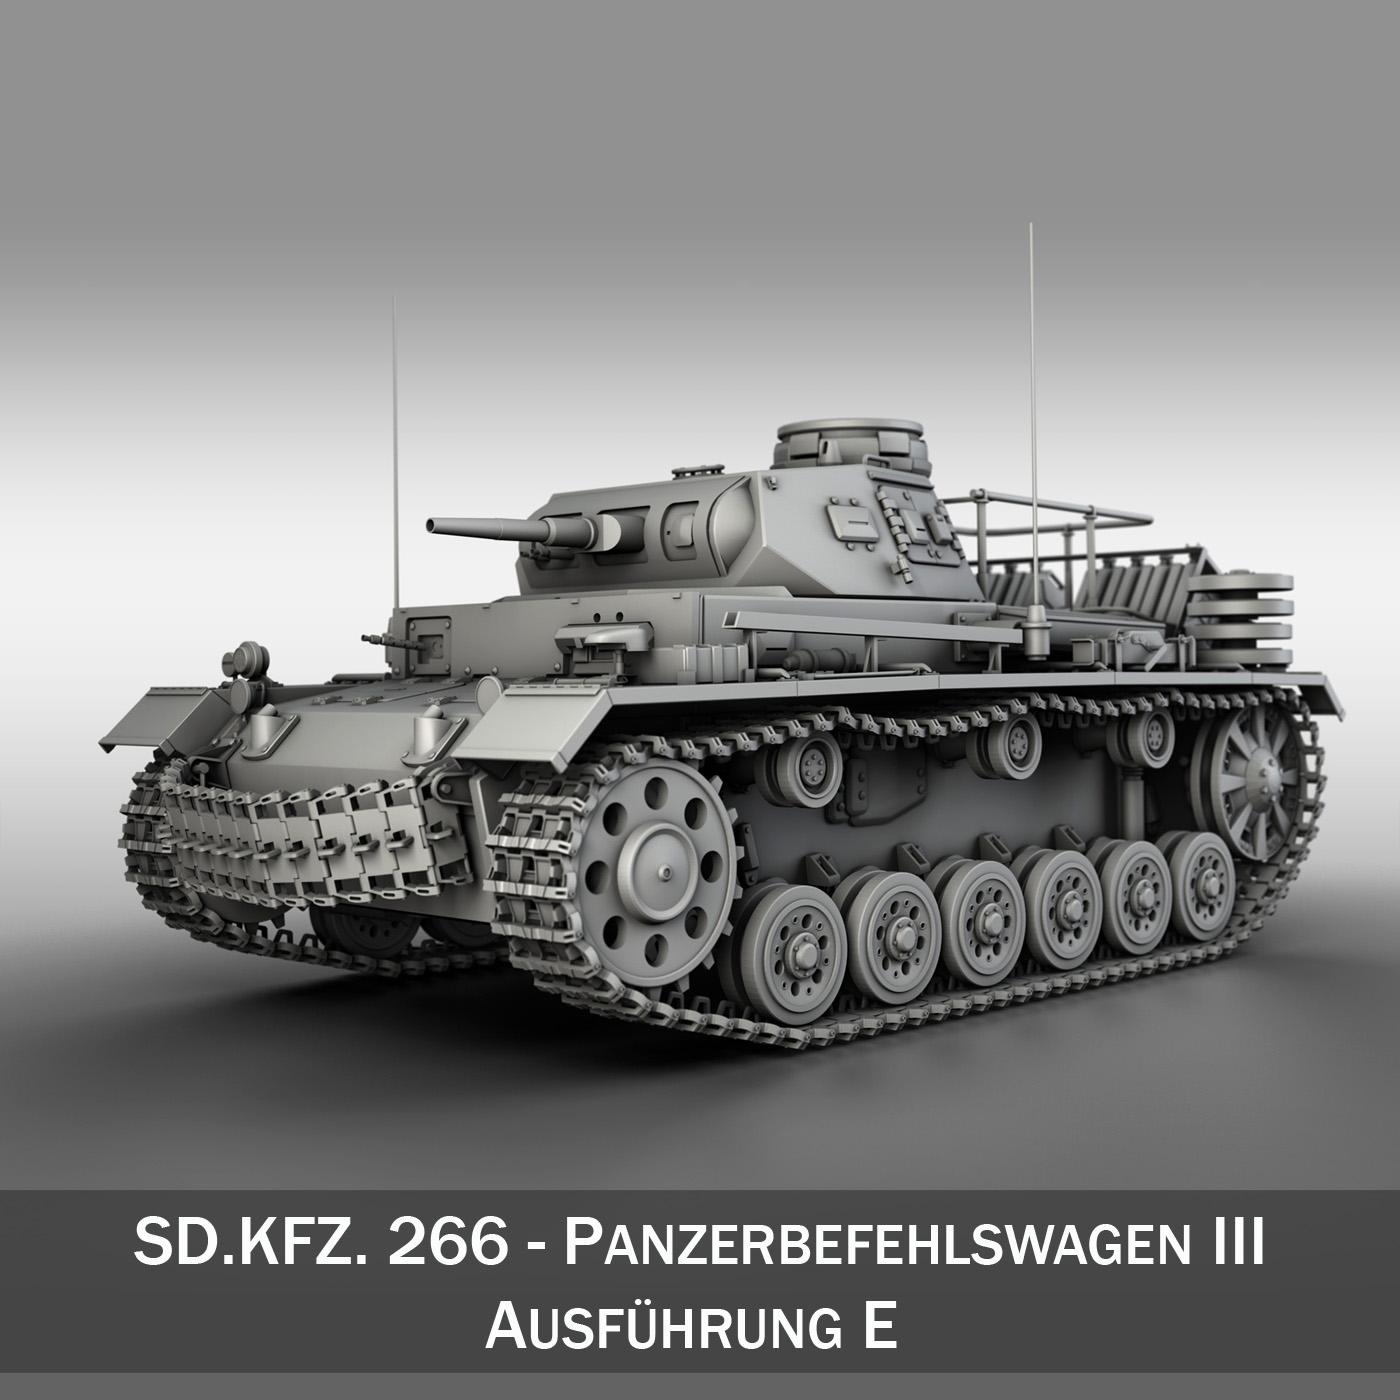 pzbefwg iii - ausf.e - tanc gorchymyn model 3d 3ds fbx c4d lwo obj 189039